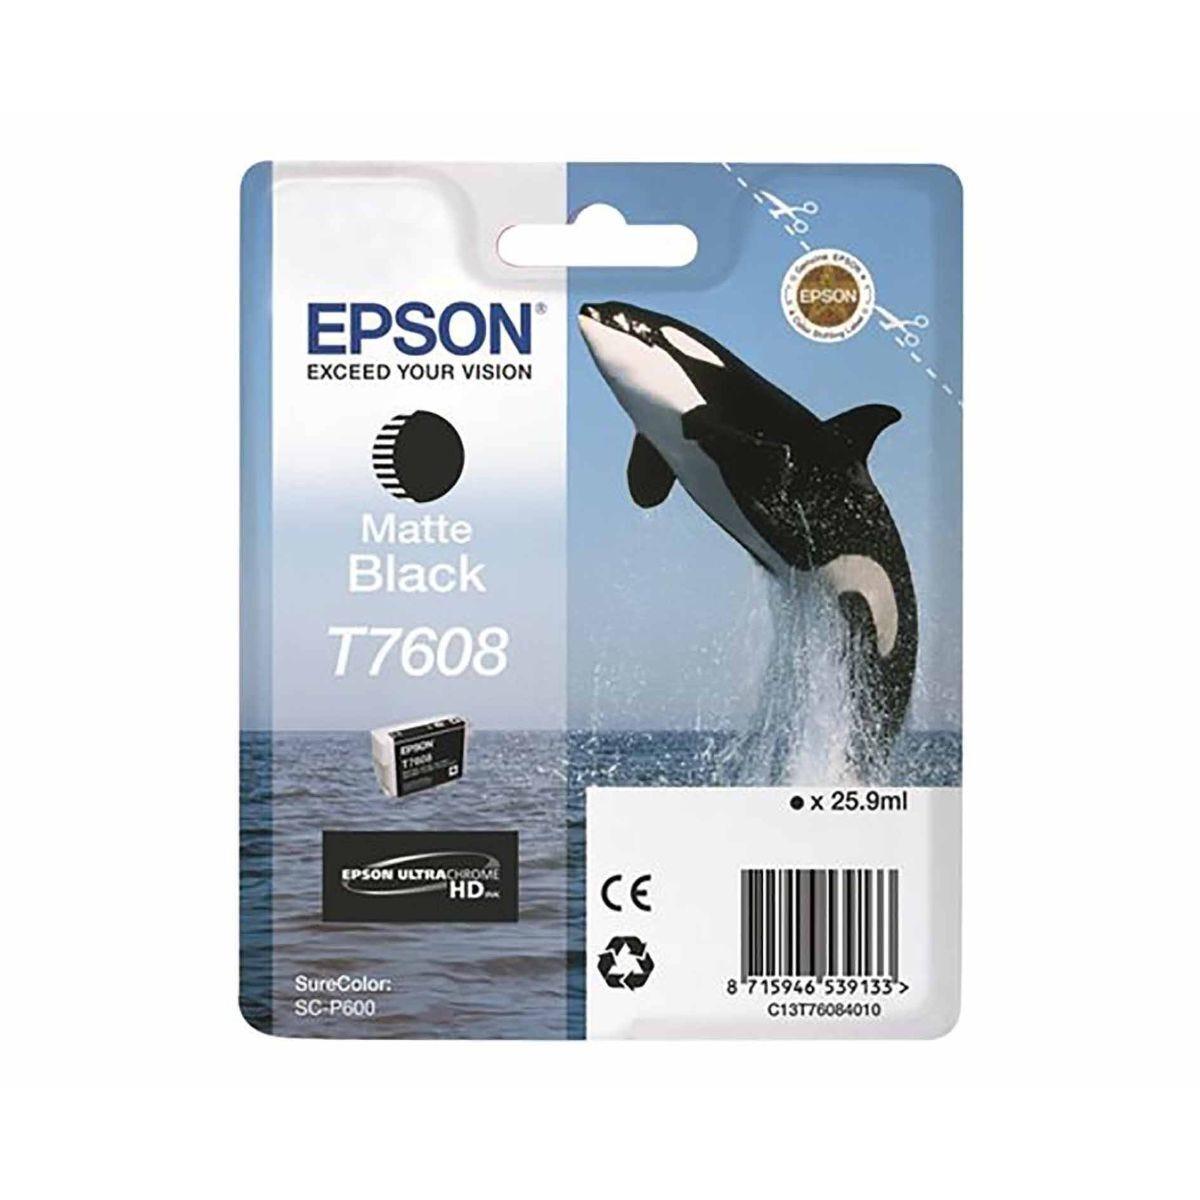 Epson T7608 Ink Cartridge Matte Black